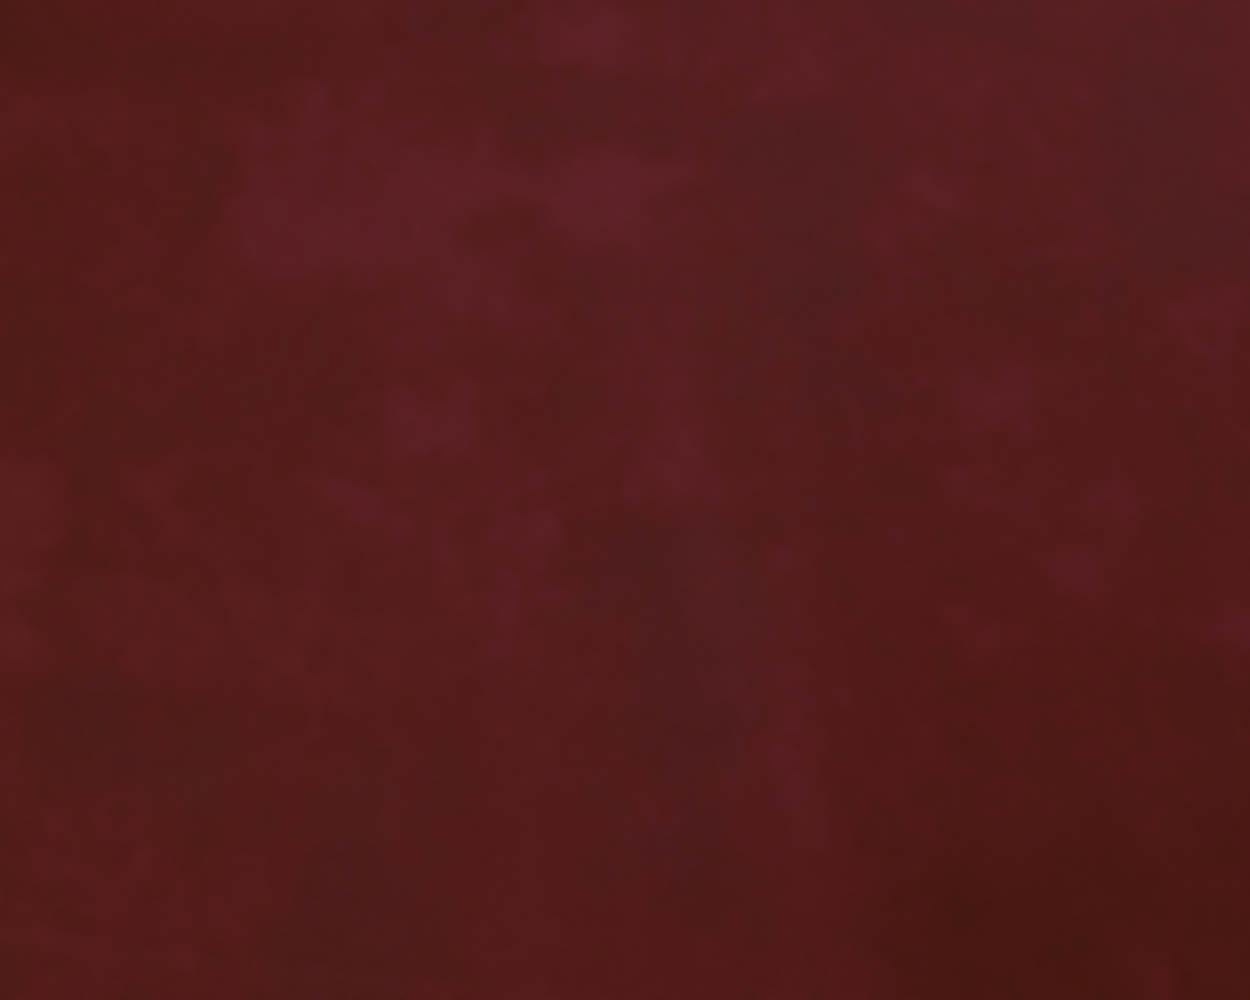 Kaminofen Justus Meva Abdeckplatte Keramik Bordeauxrot Bild 4